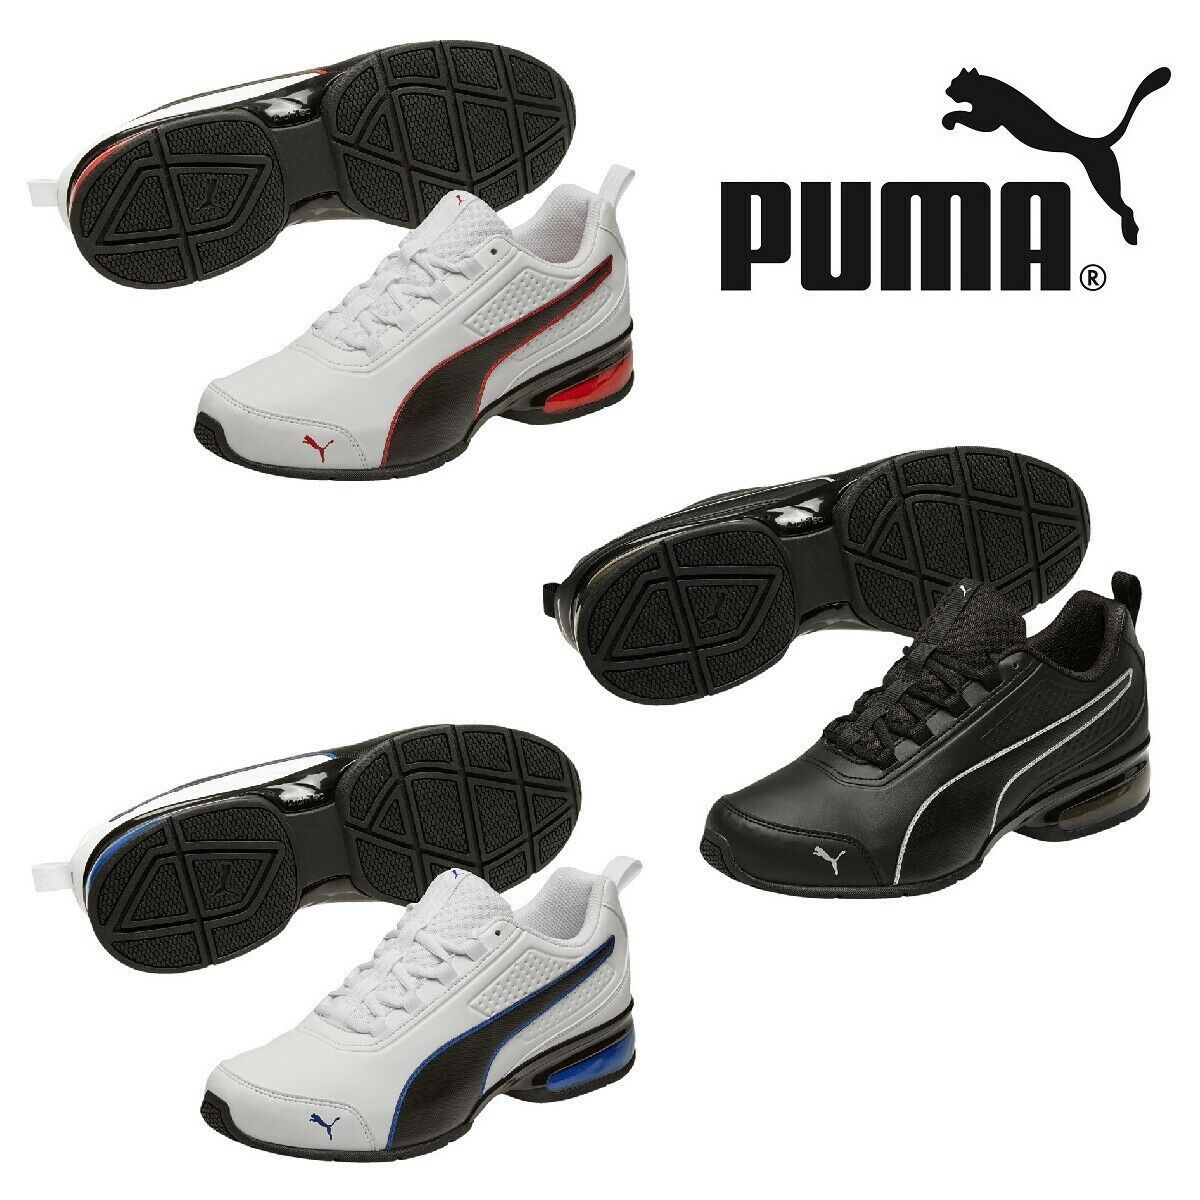 Details zu Puma Herren Sneaker Leader VT SL Schuhe